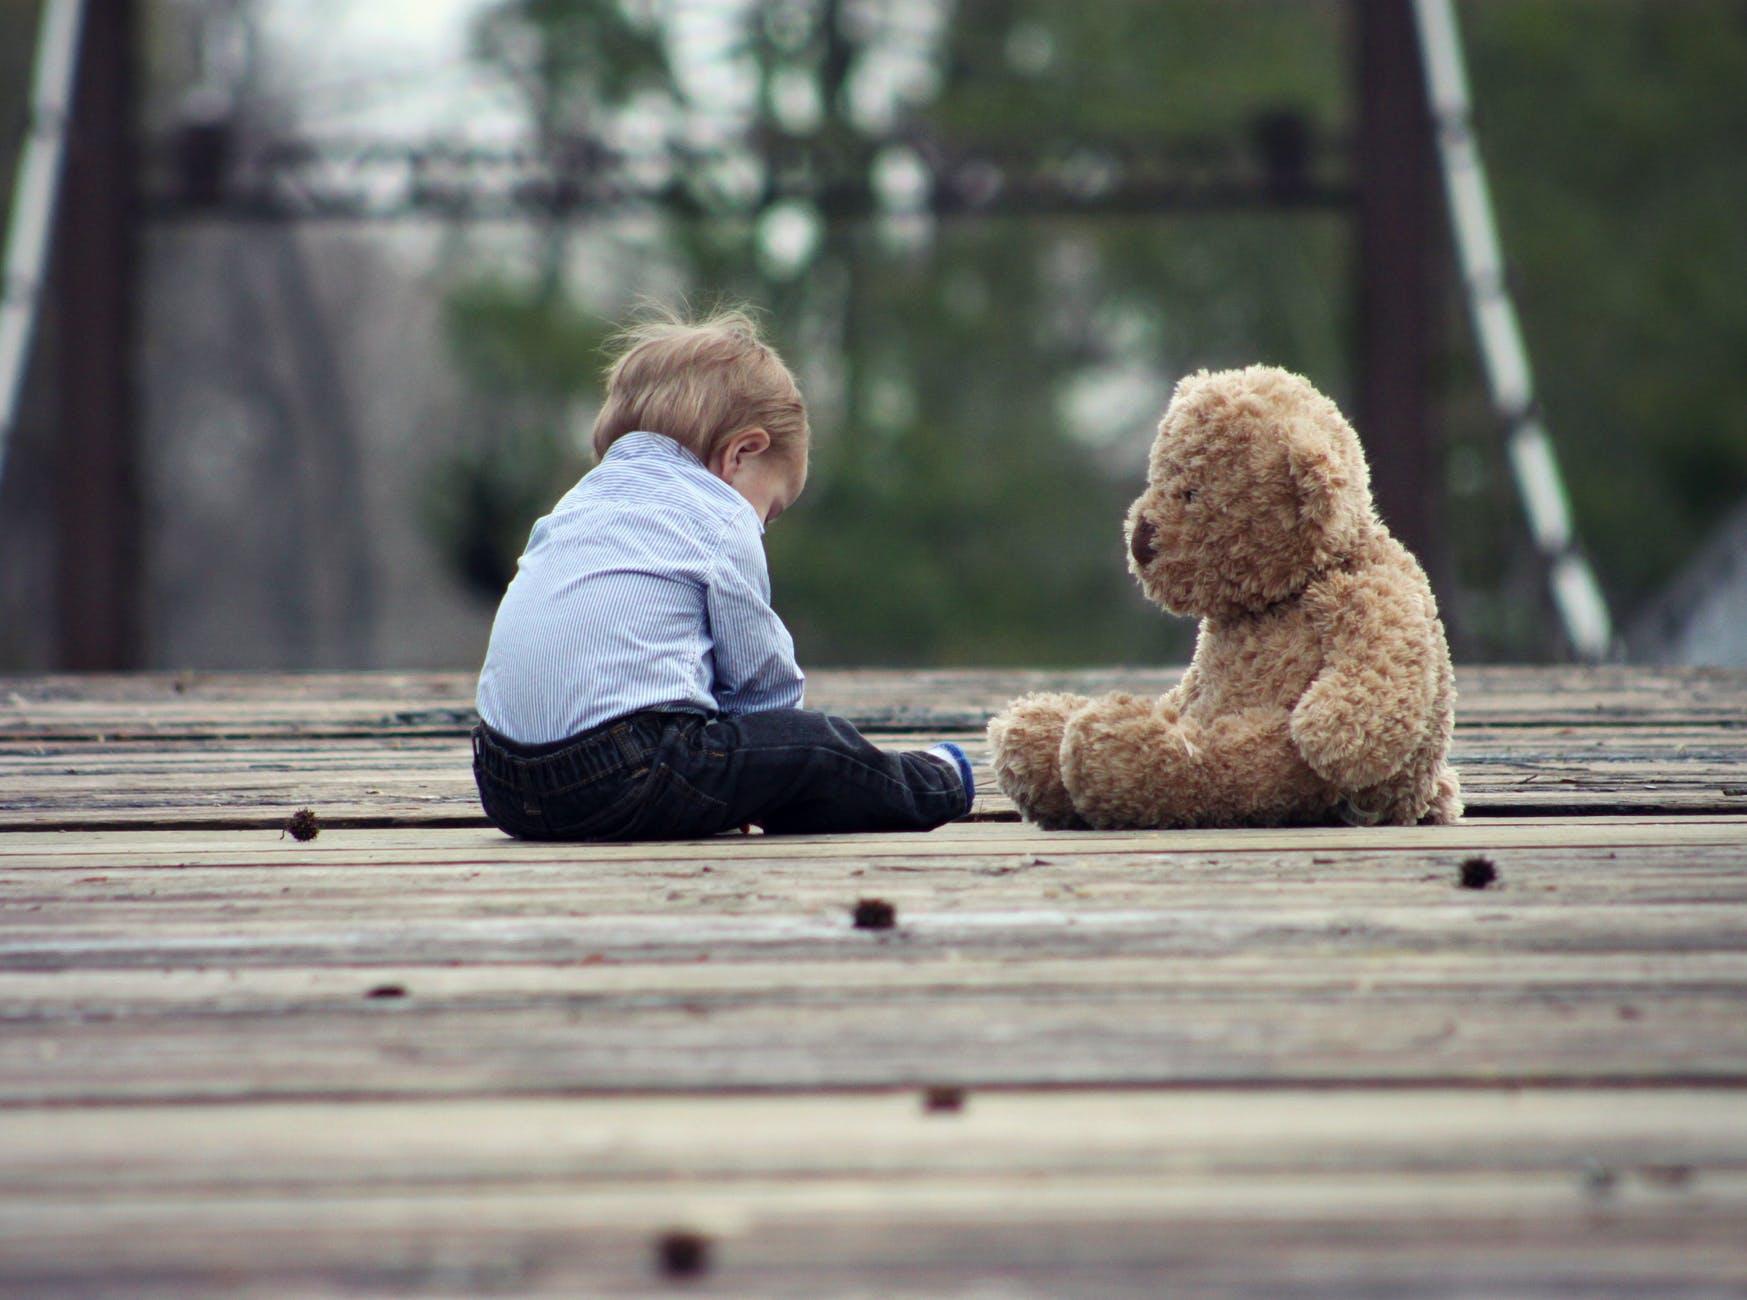 baby-teddy-bear-cute-39369.jpeg